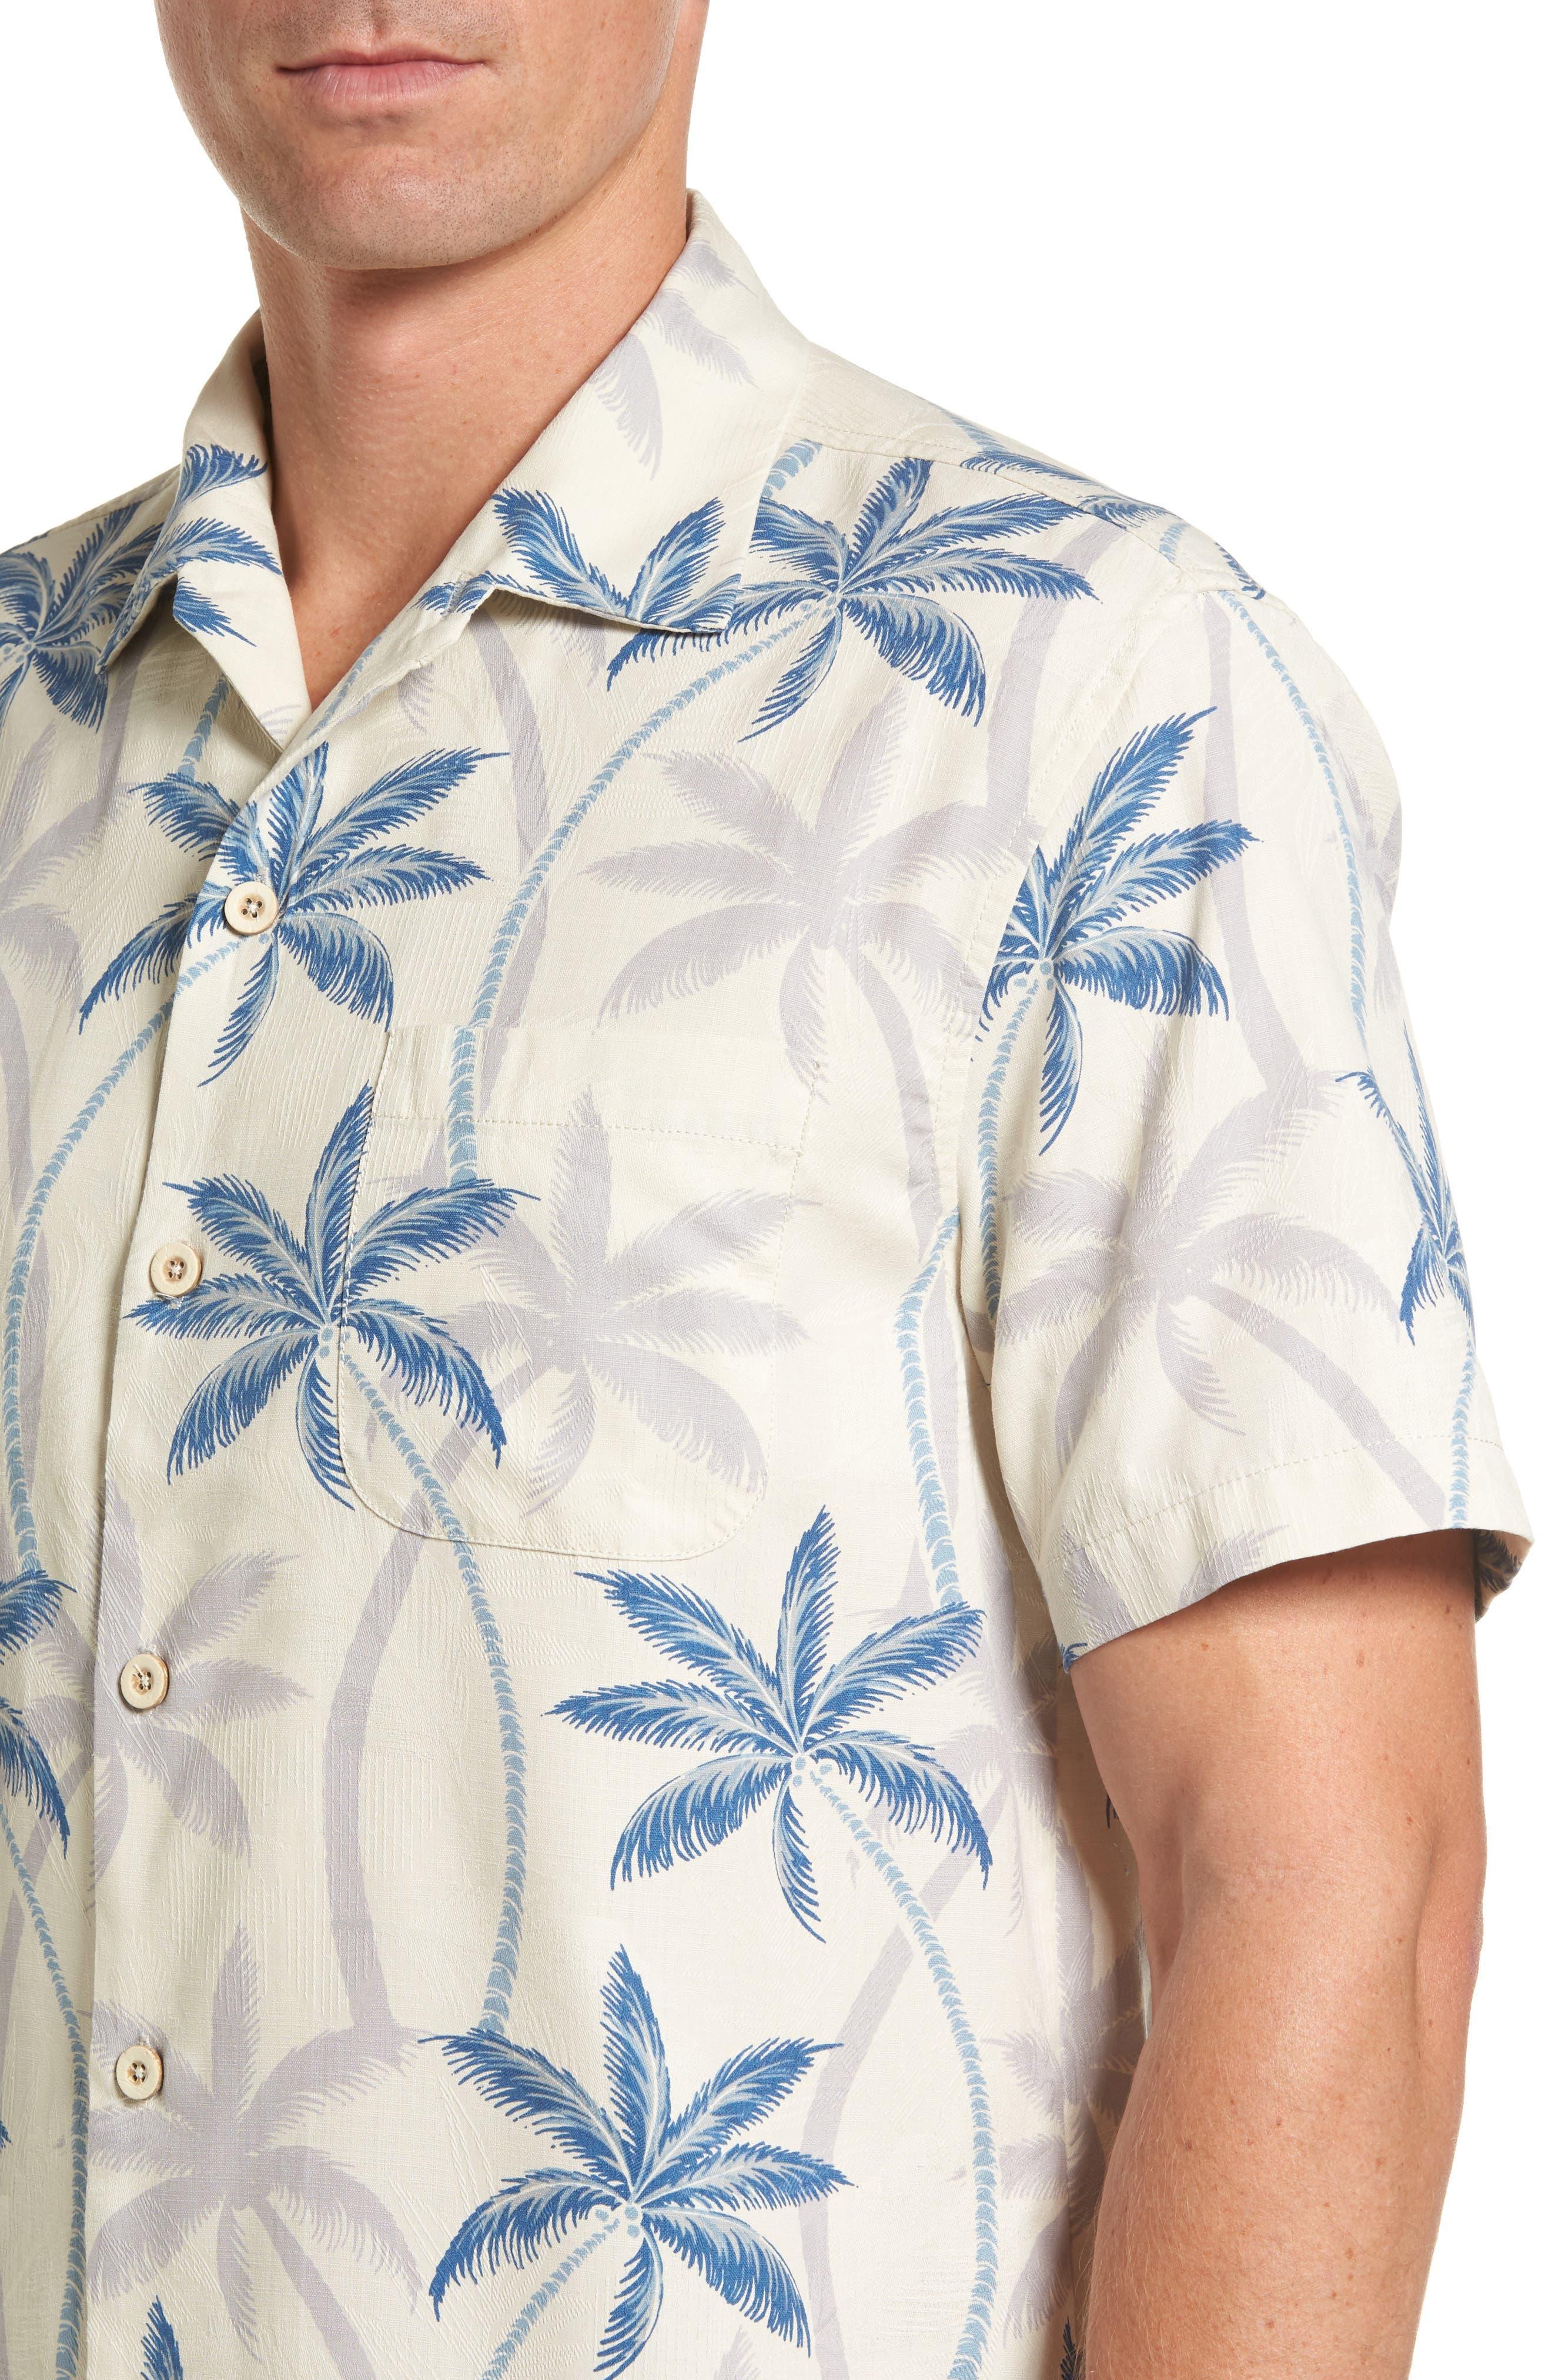 Palmas Palooza Woven Shirt,                             Alternate thumbnail 4, color,                             Continental